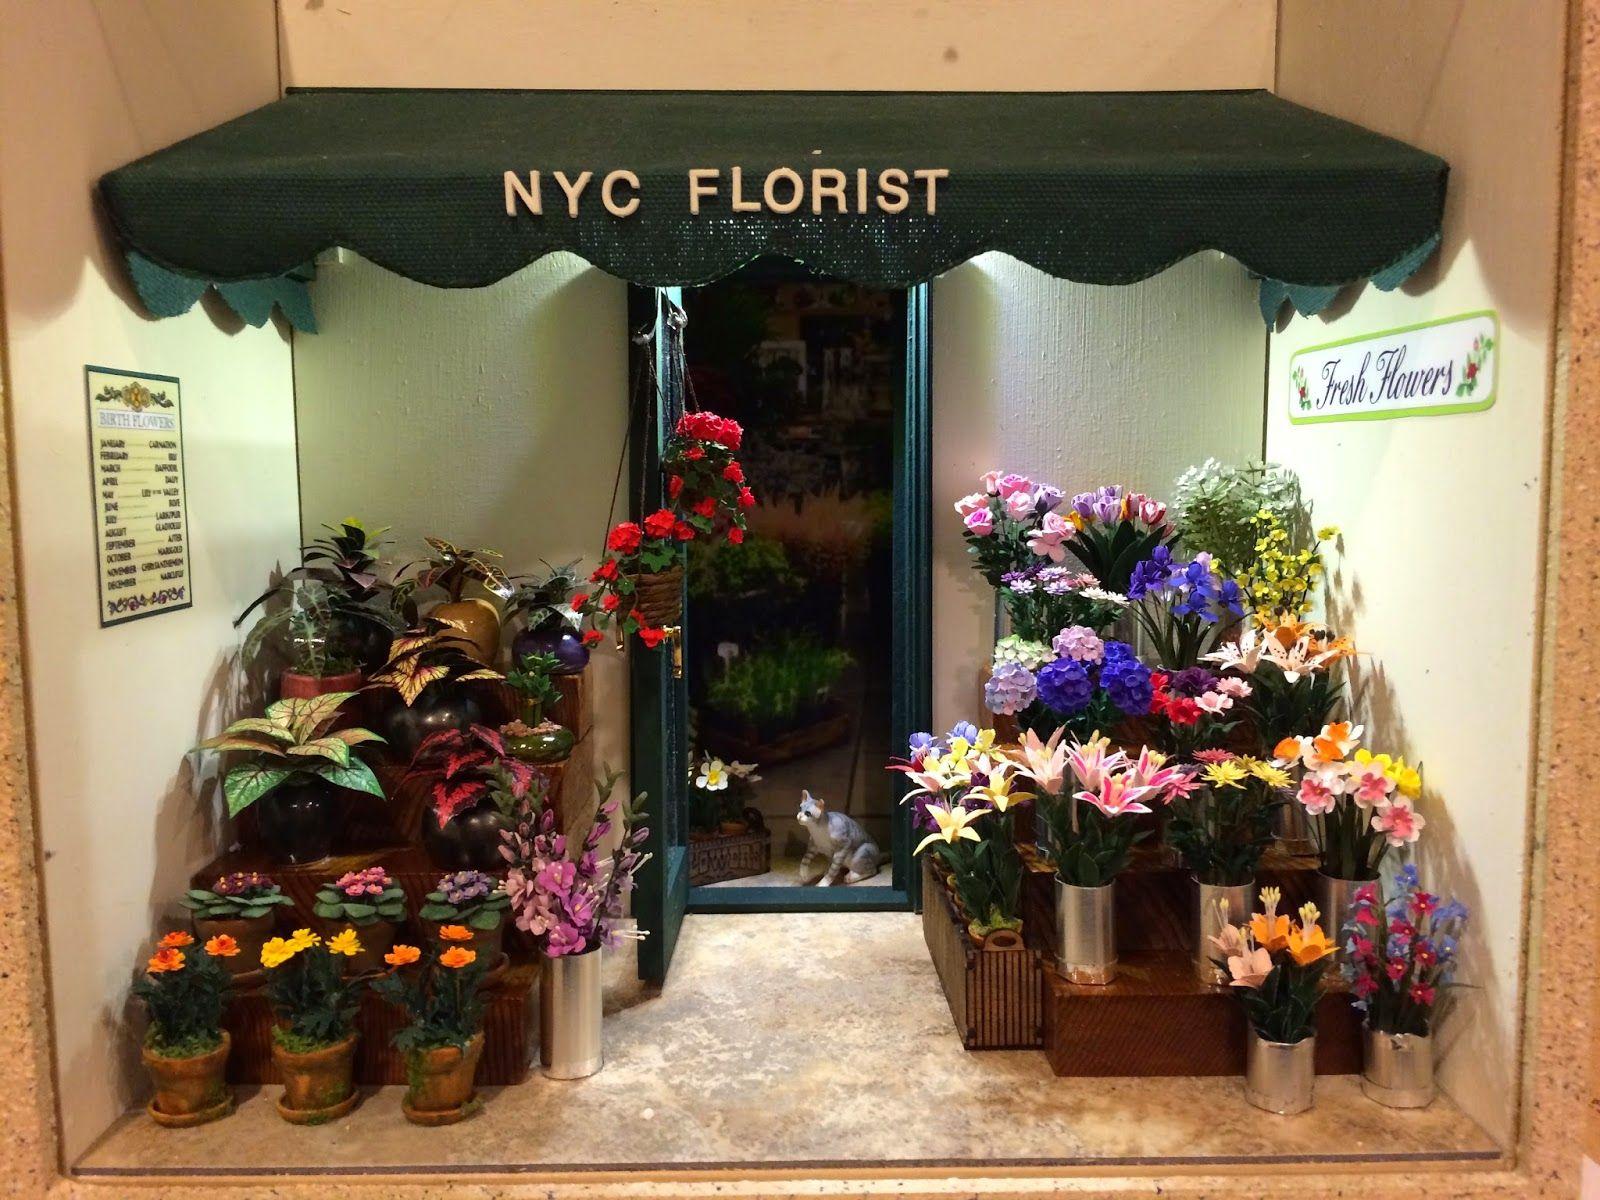 Arlene Finkelstein's New York City Florist Shop (With